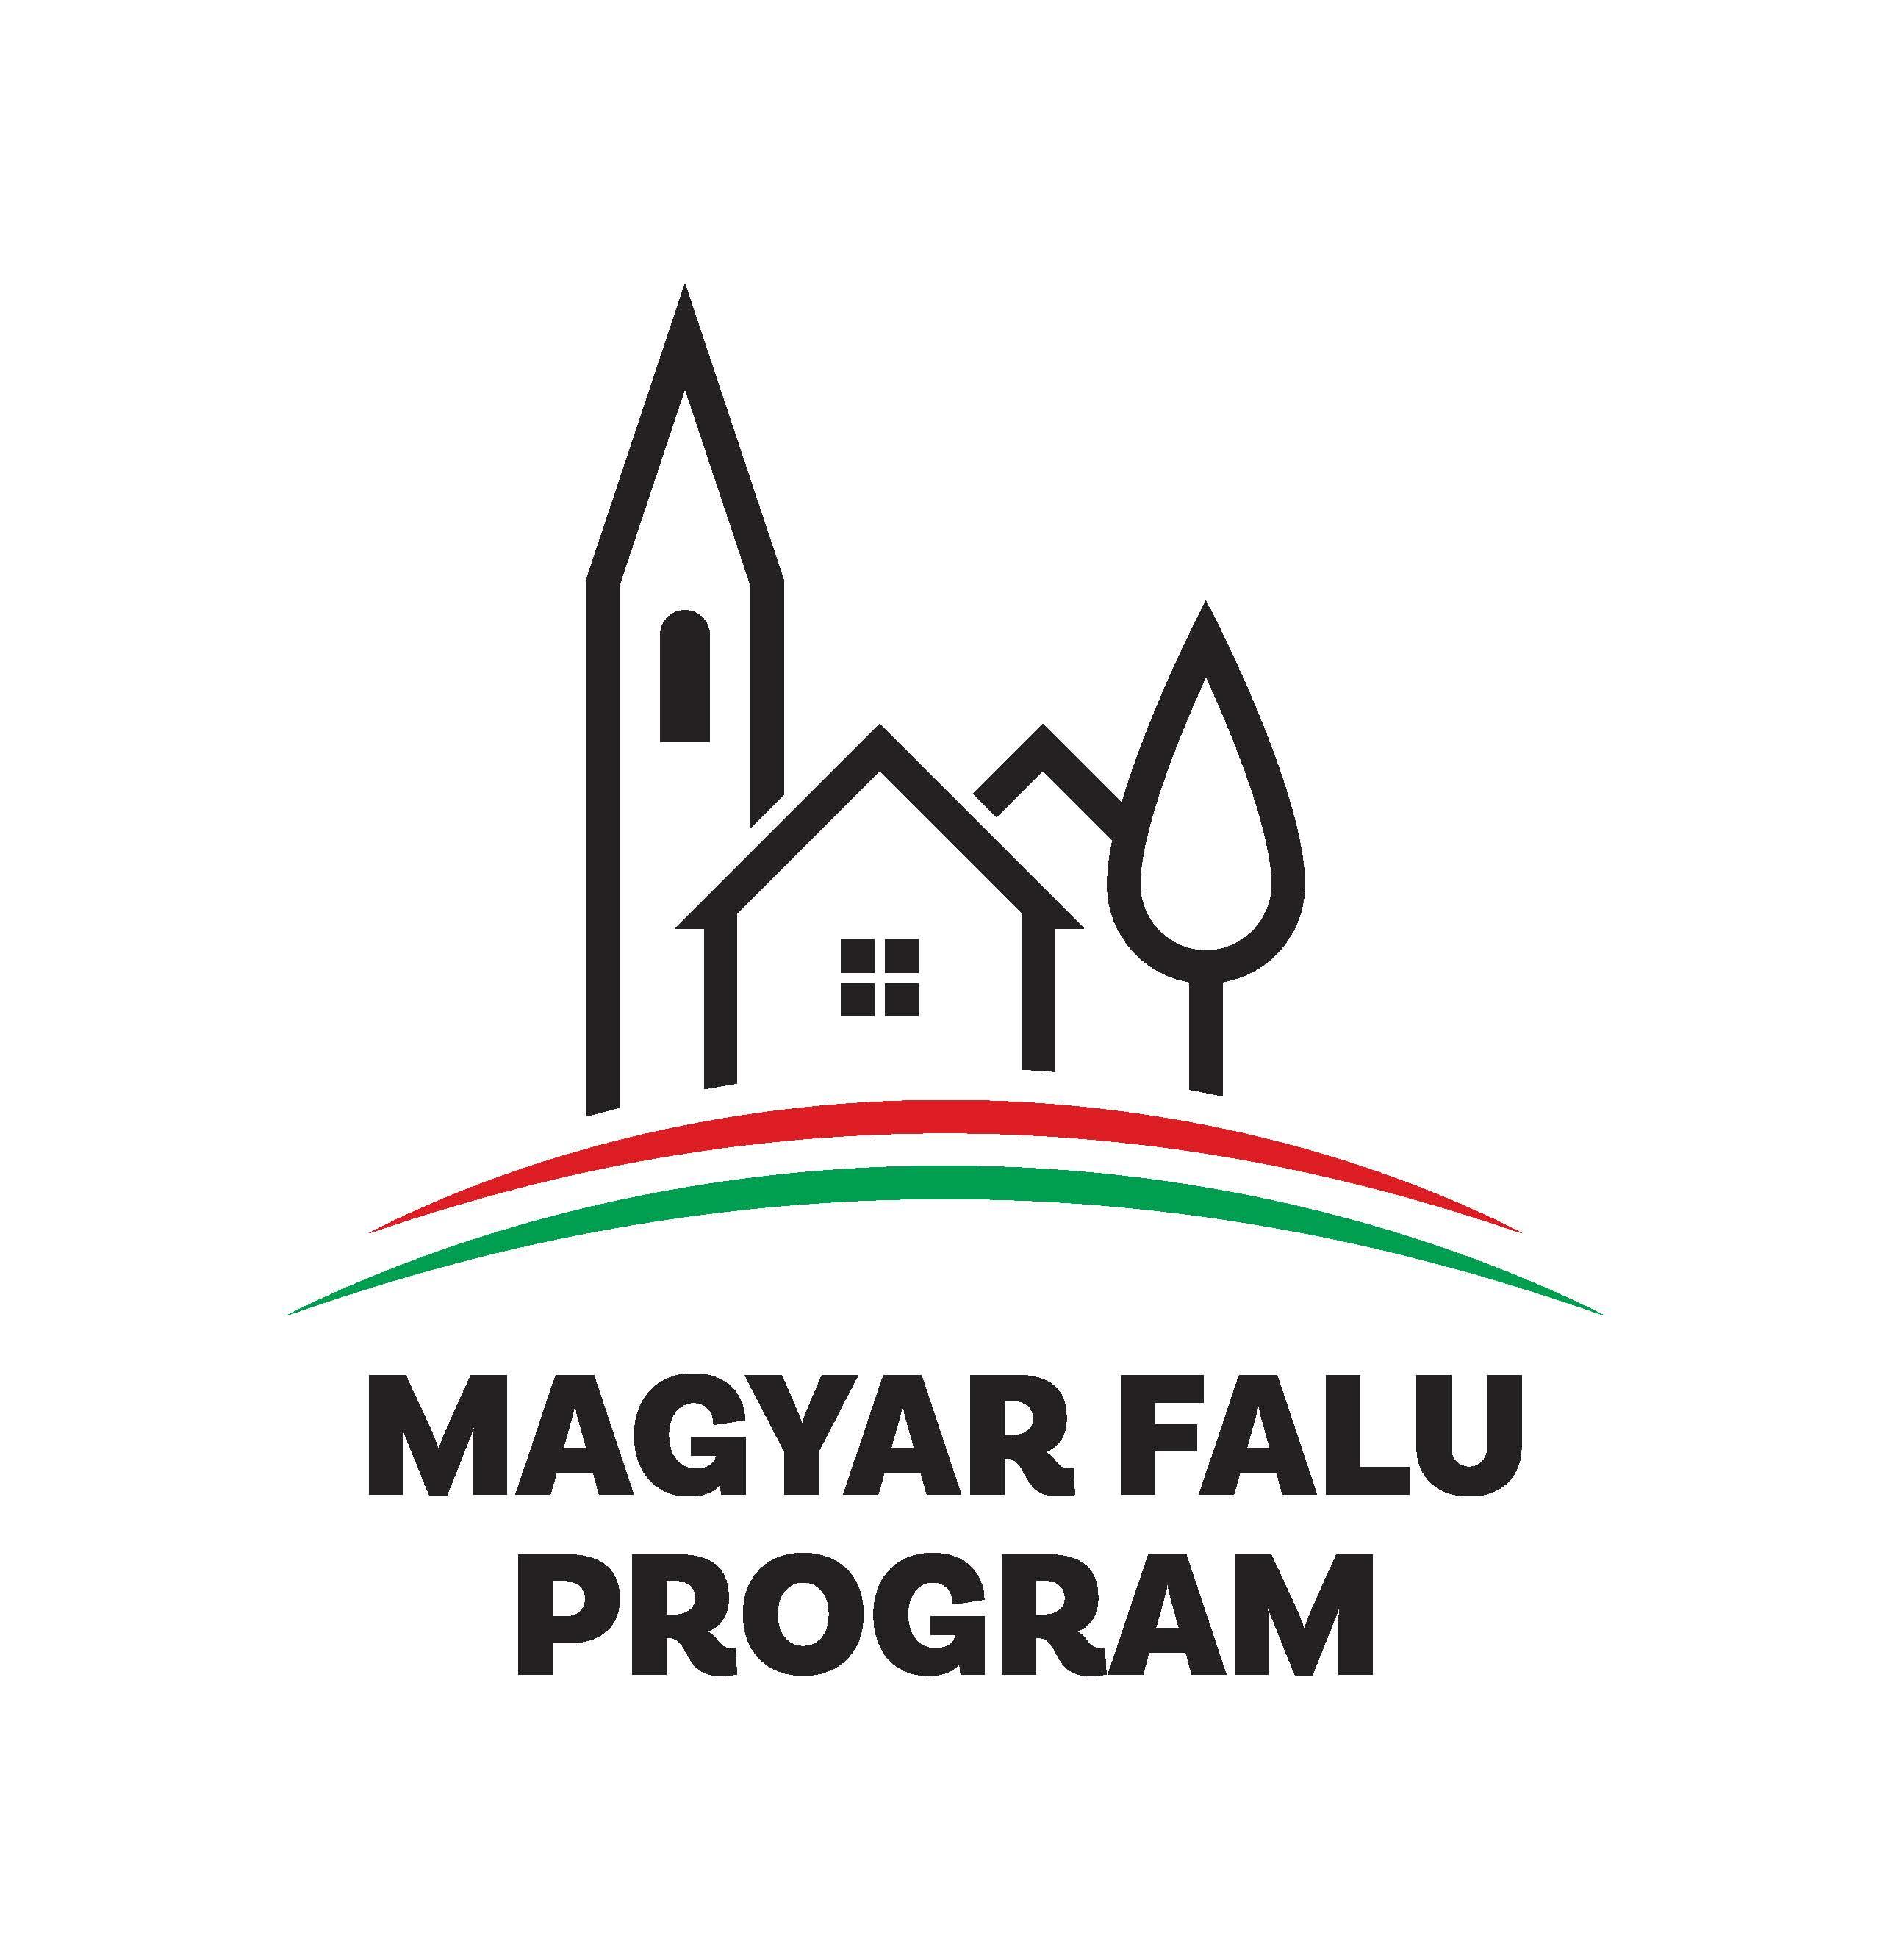 Falu_program